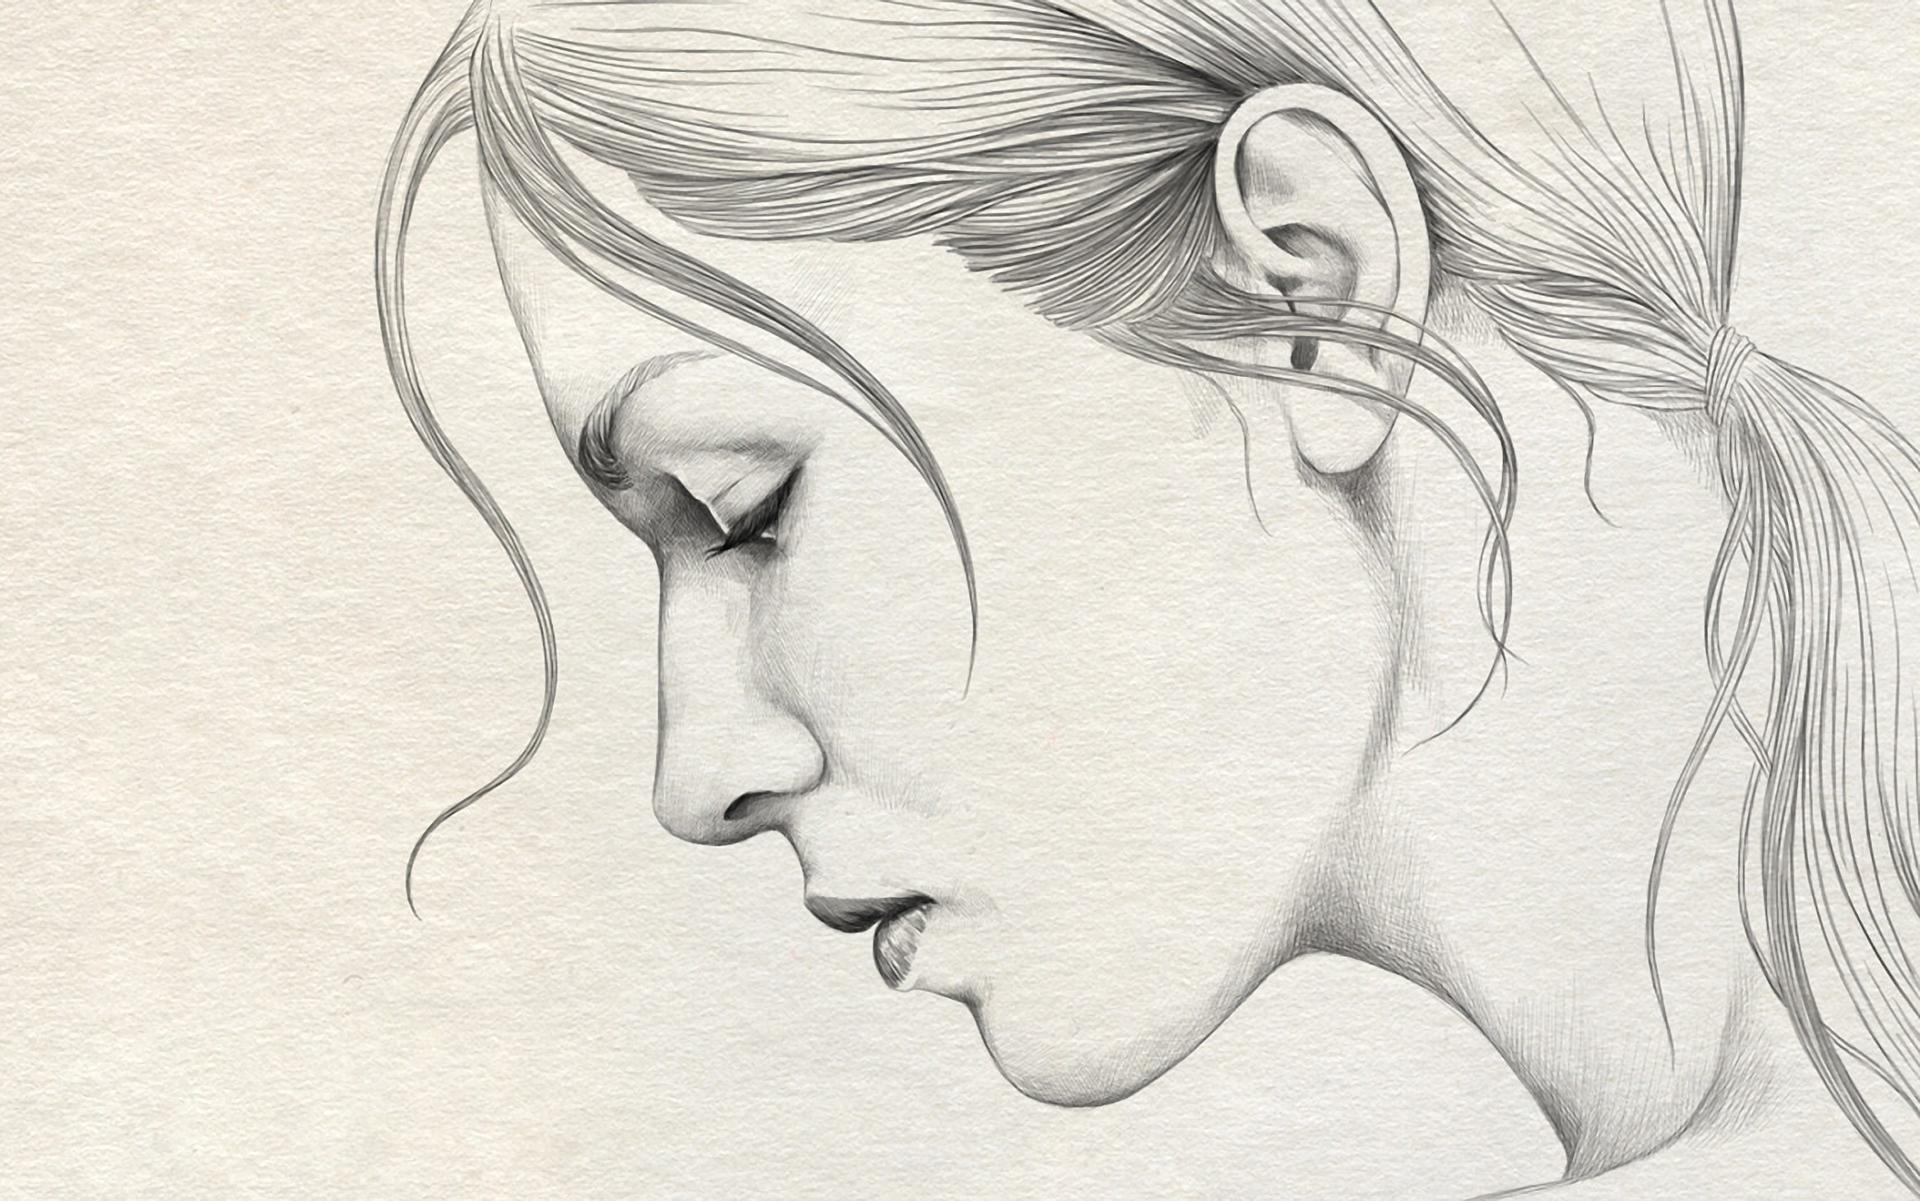 1920x1201 Pencil Sketch Of Simple Girl